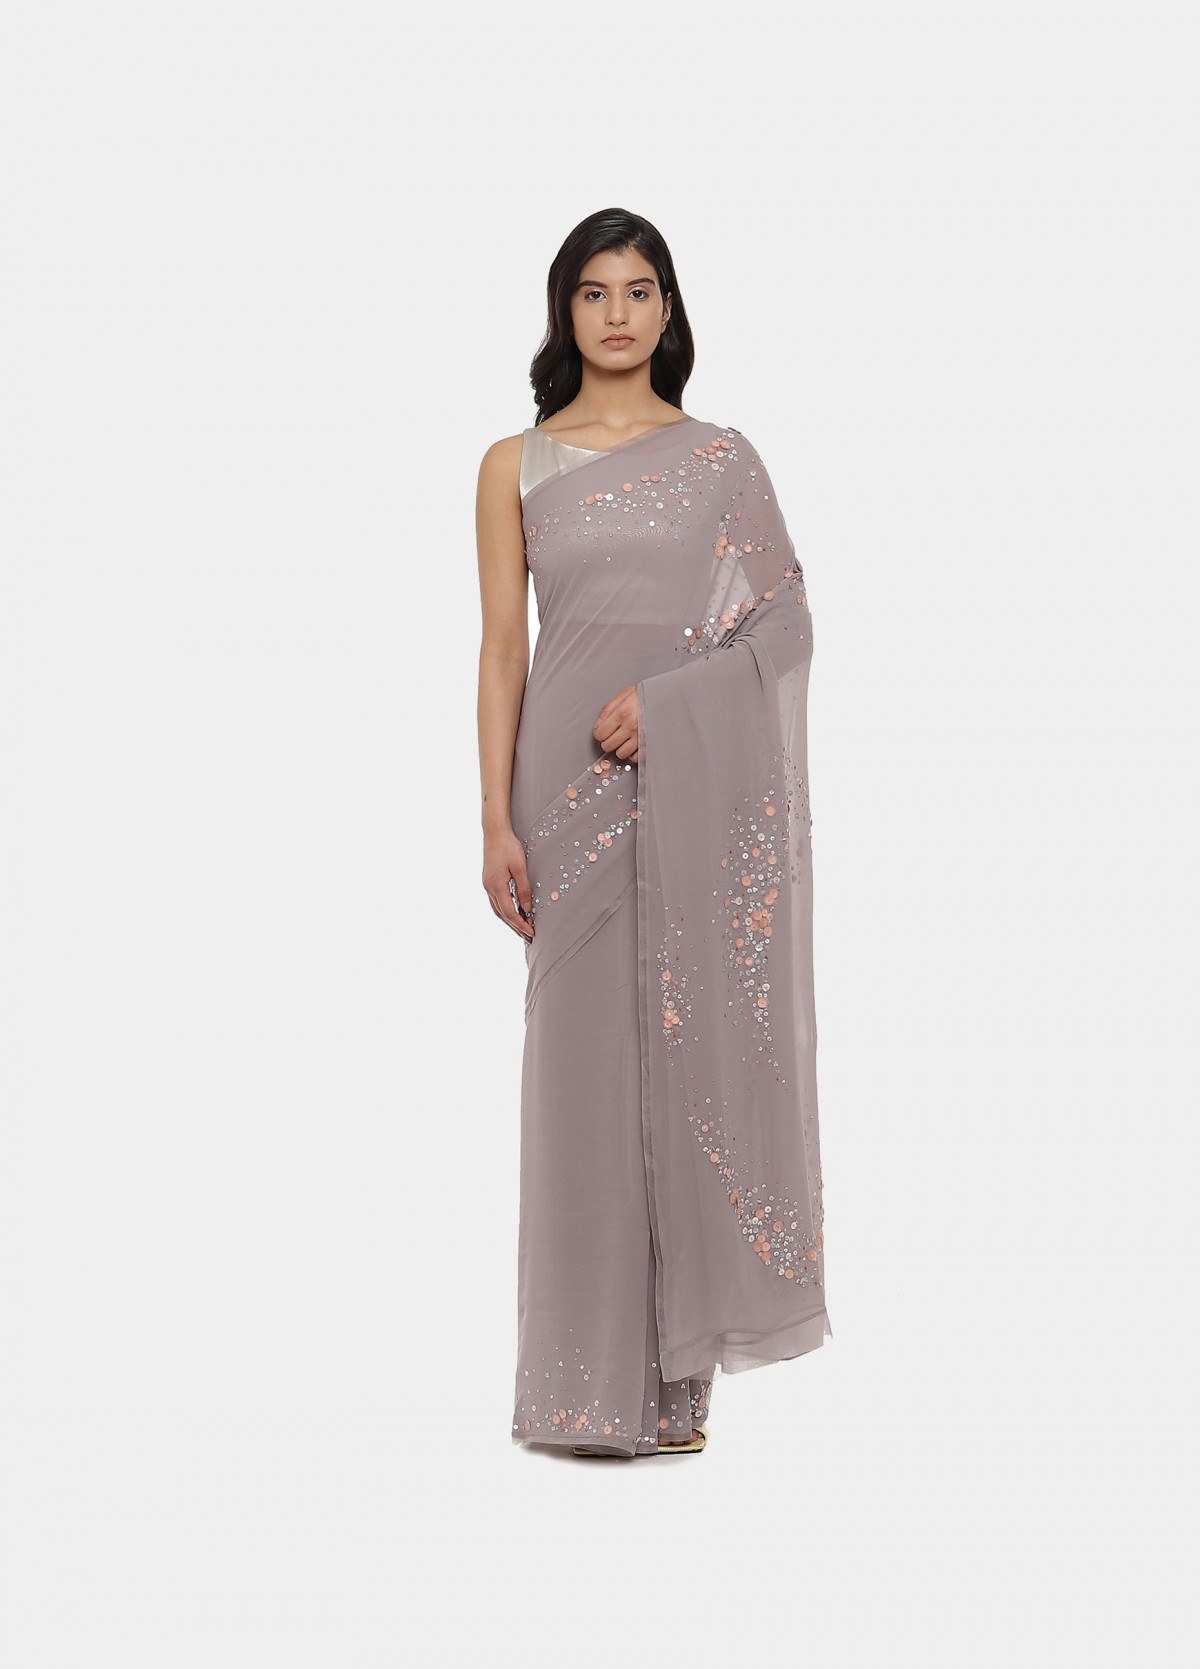 The Mirage Sari